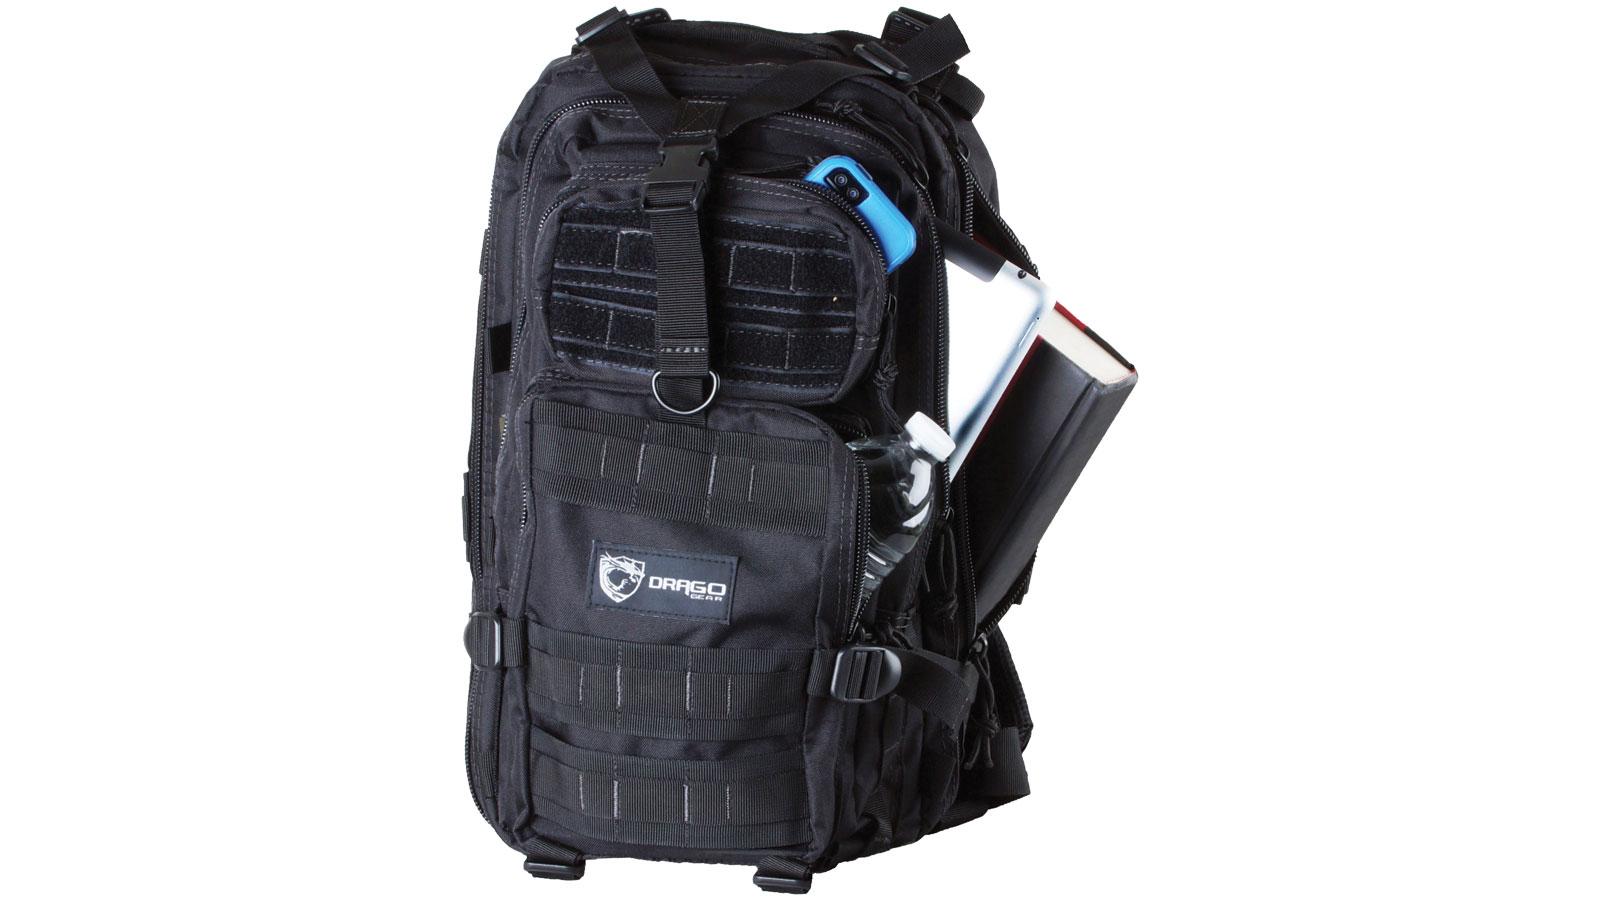 Drago Gear 14301BL Tracker Backpack 600D Polyester 18 x 11 in.  x 11 in.  Black in.